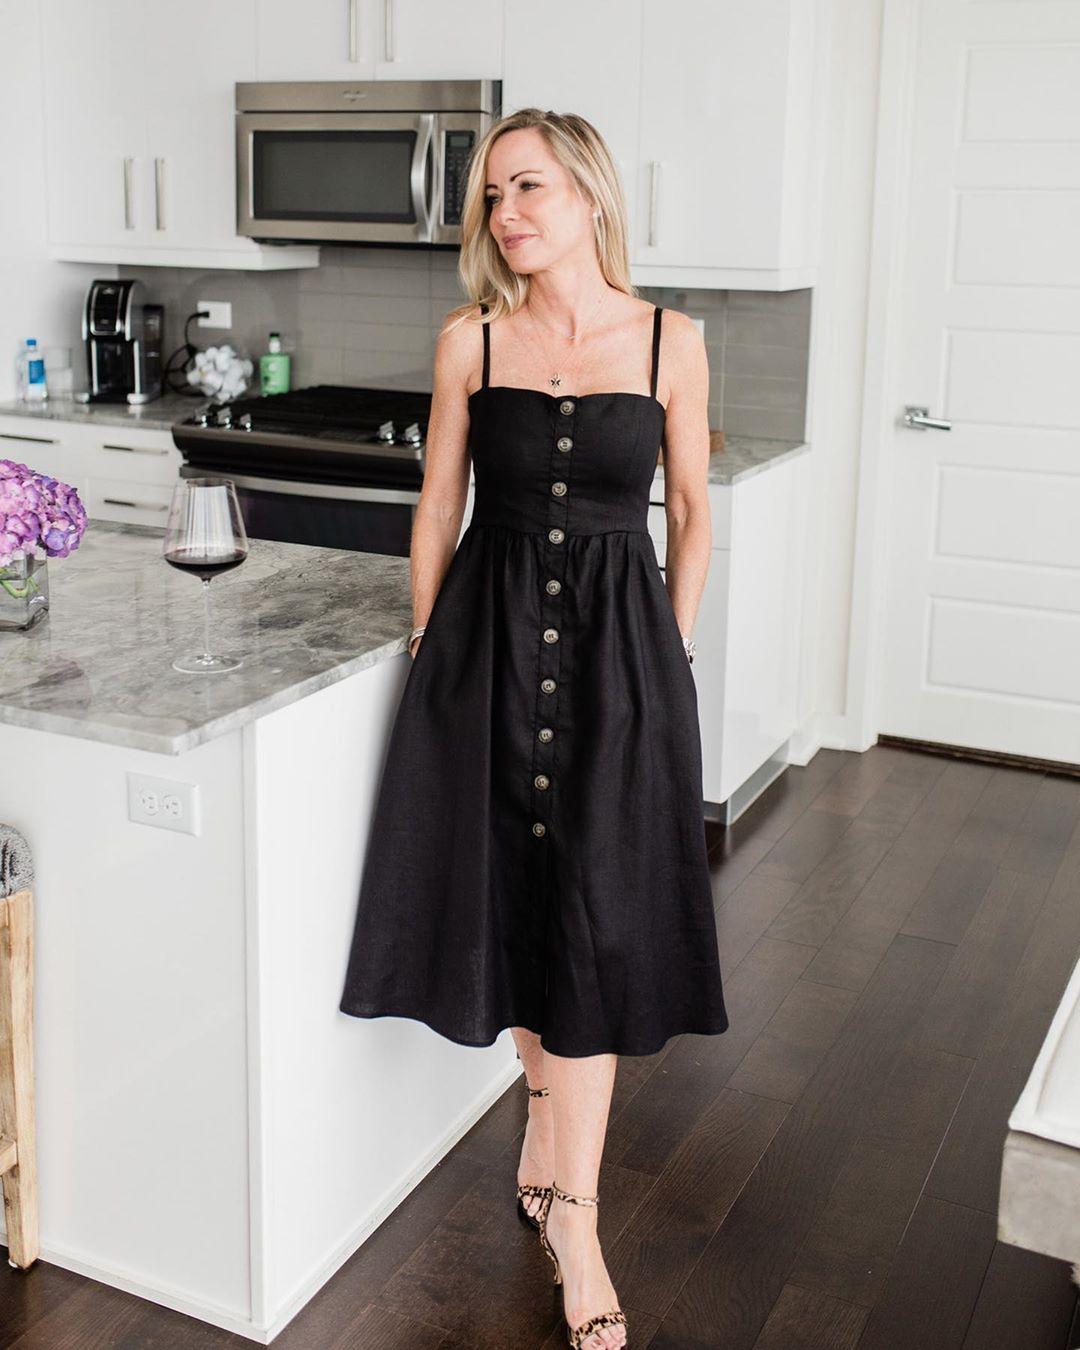 Vestido abotonado de tirantes color negro para mujer madura